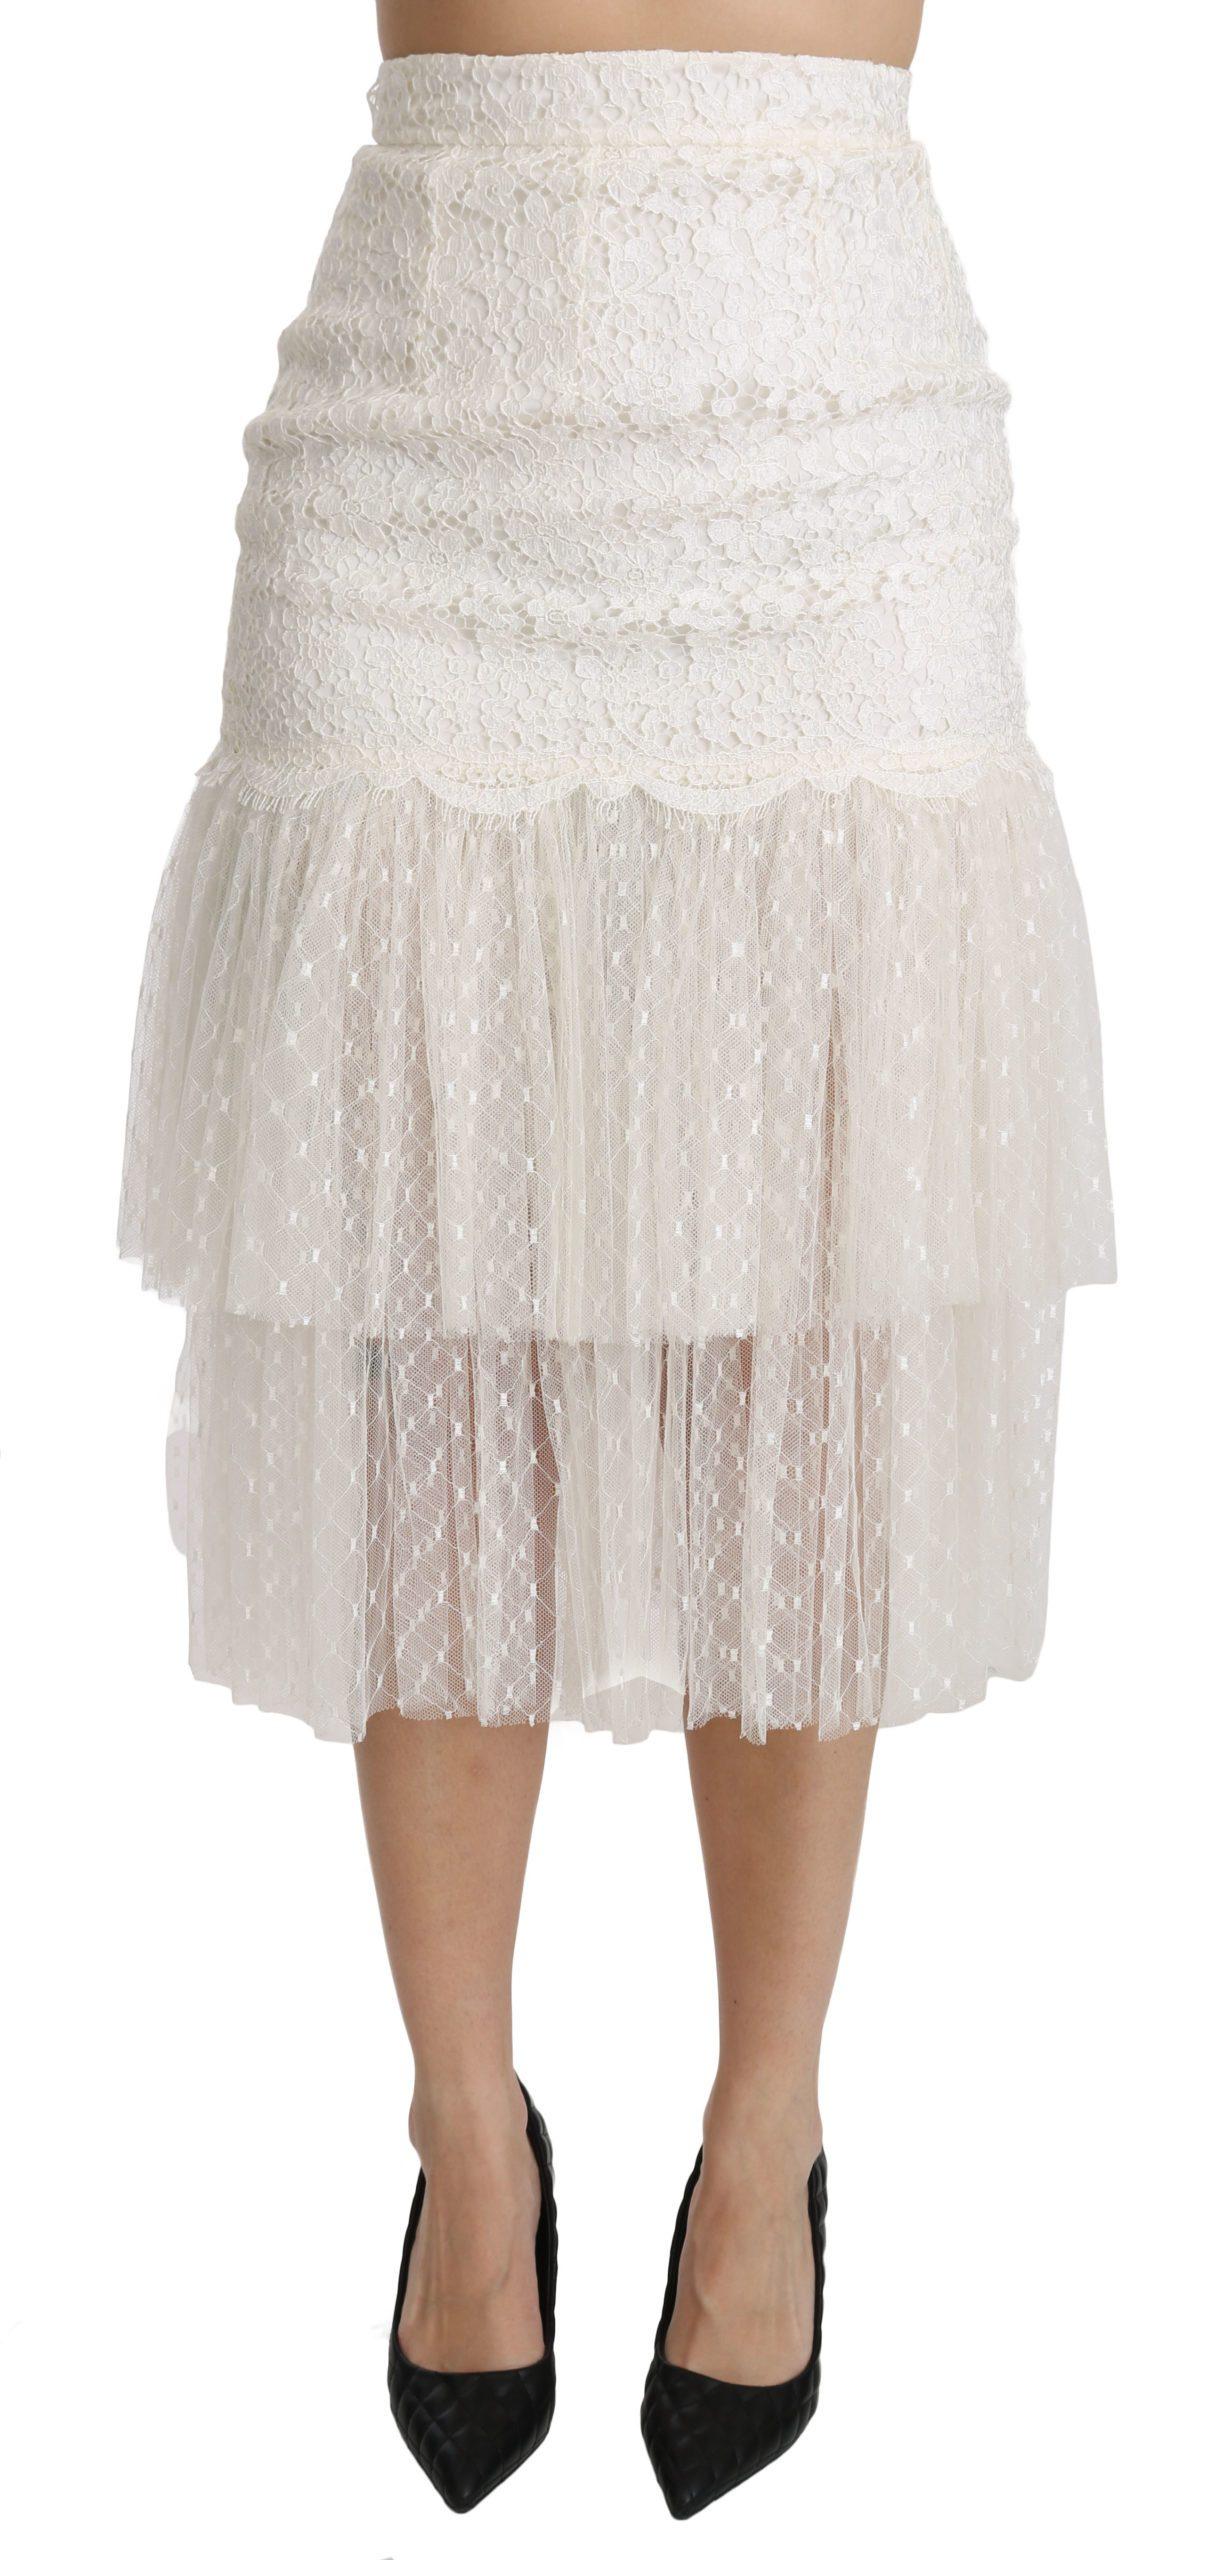 Dolce & Gabbana Women's Lace Layered High Waist Midi Cotton Skirt White SKI1344 - IT40|S